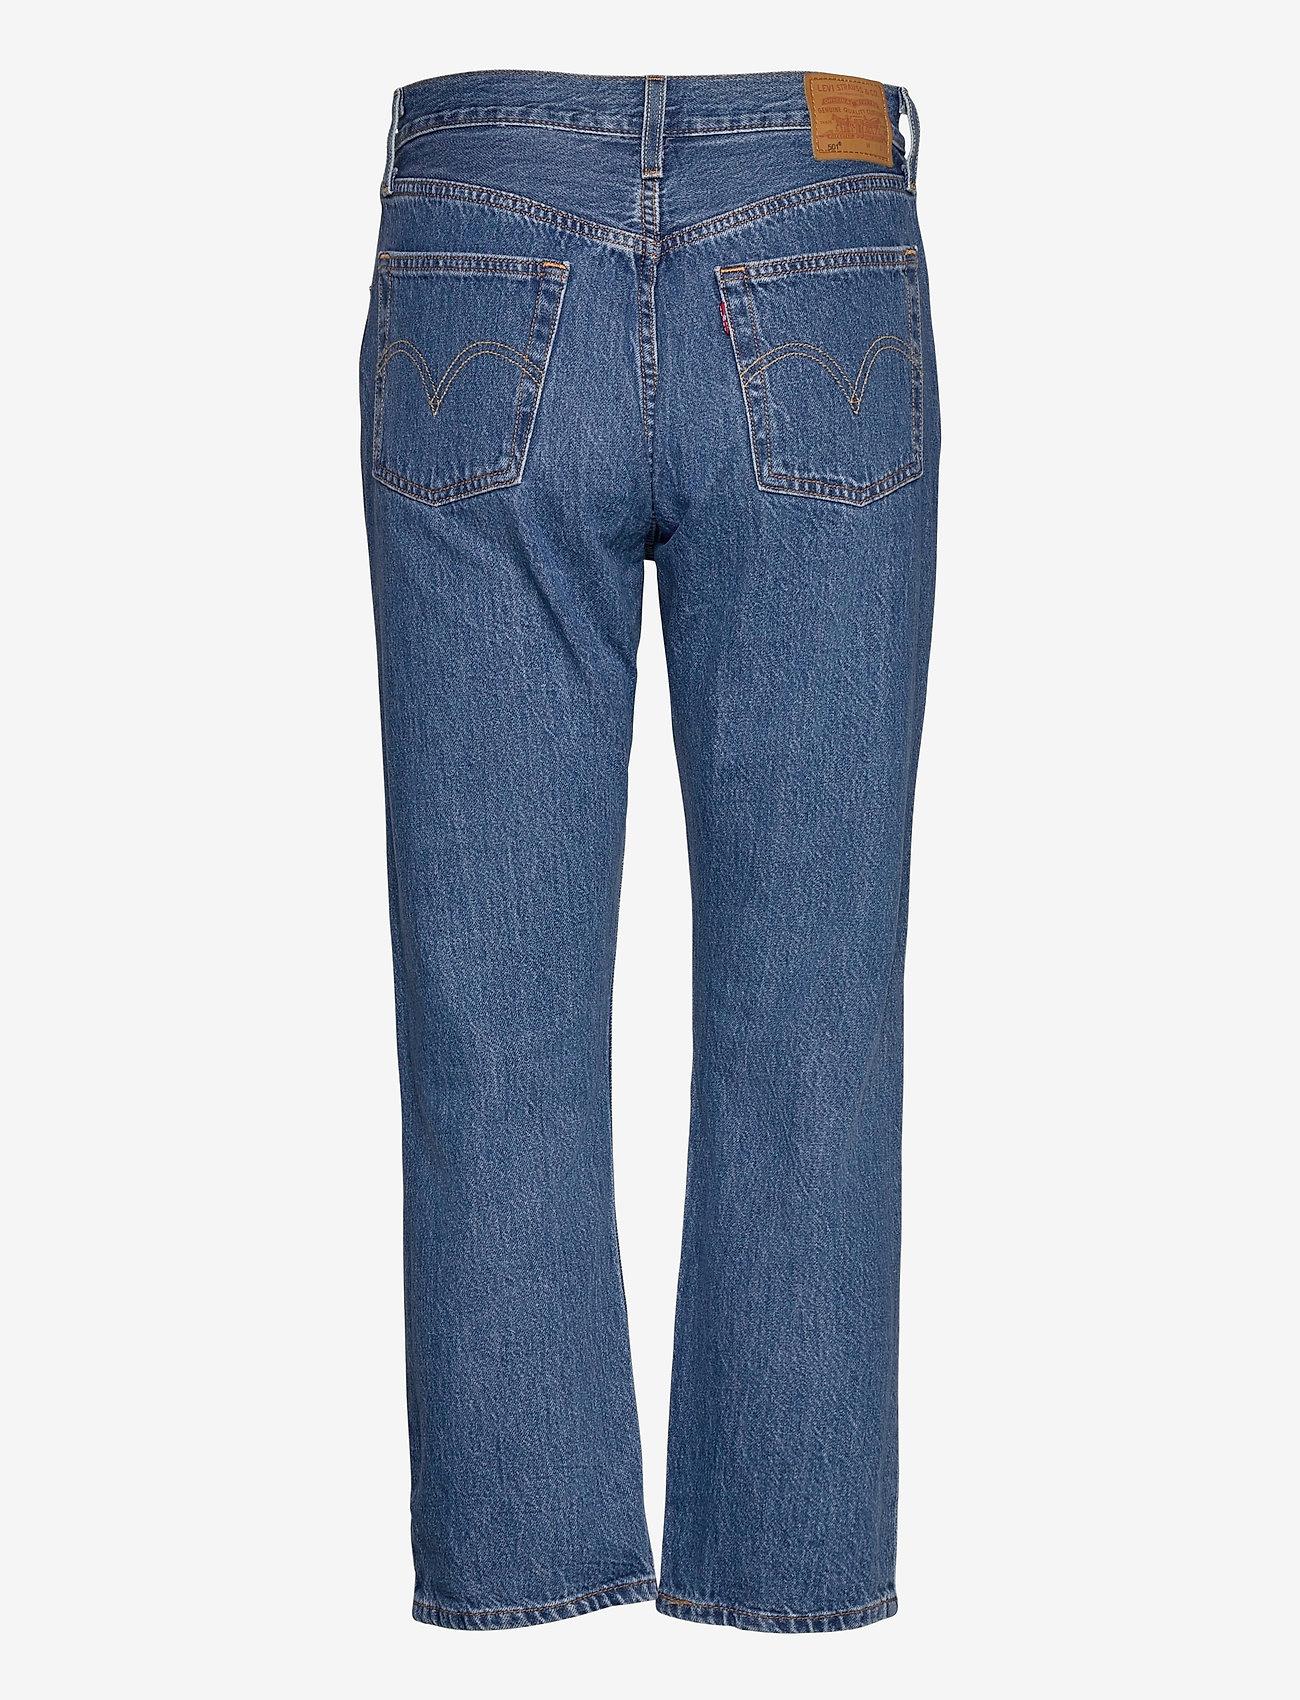 LEVI´S Women - 501 CROP SANSOME BREEZE STONE - mom jeans - med indigo - worn in - 1